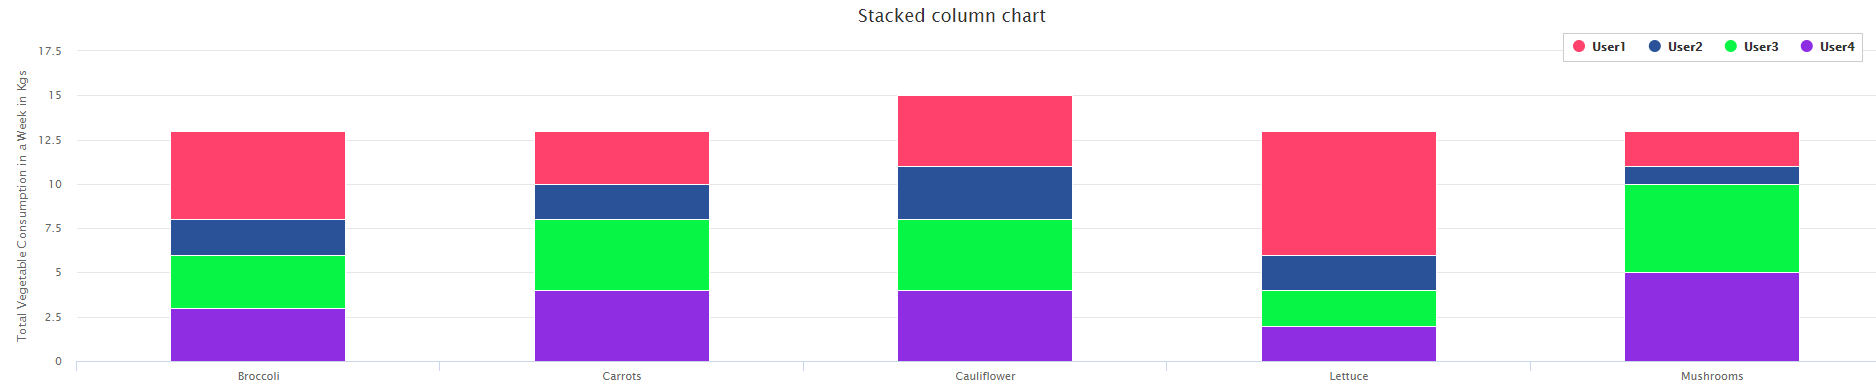 XenonStack Stacked Bar Chart Data Visualization Services